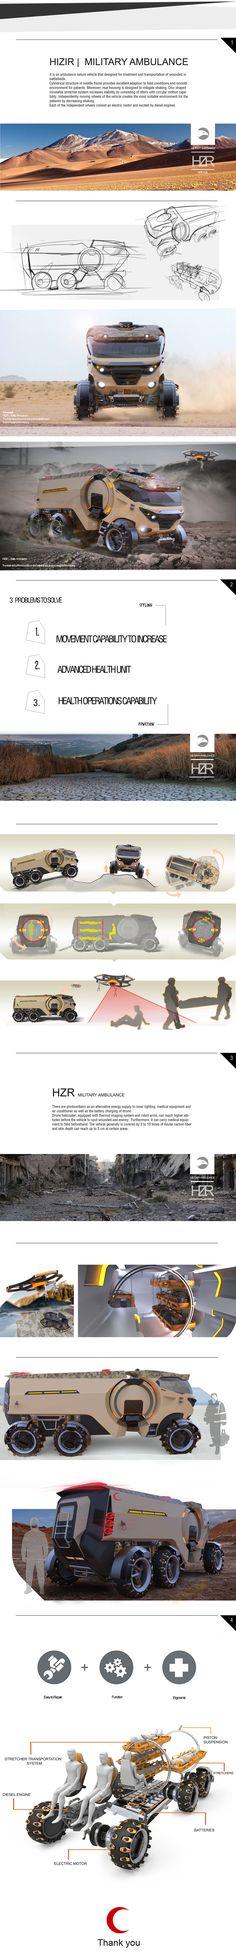 Military Ambulance | HIZIR on Behance